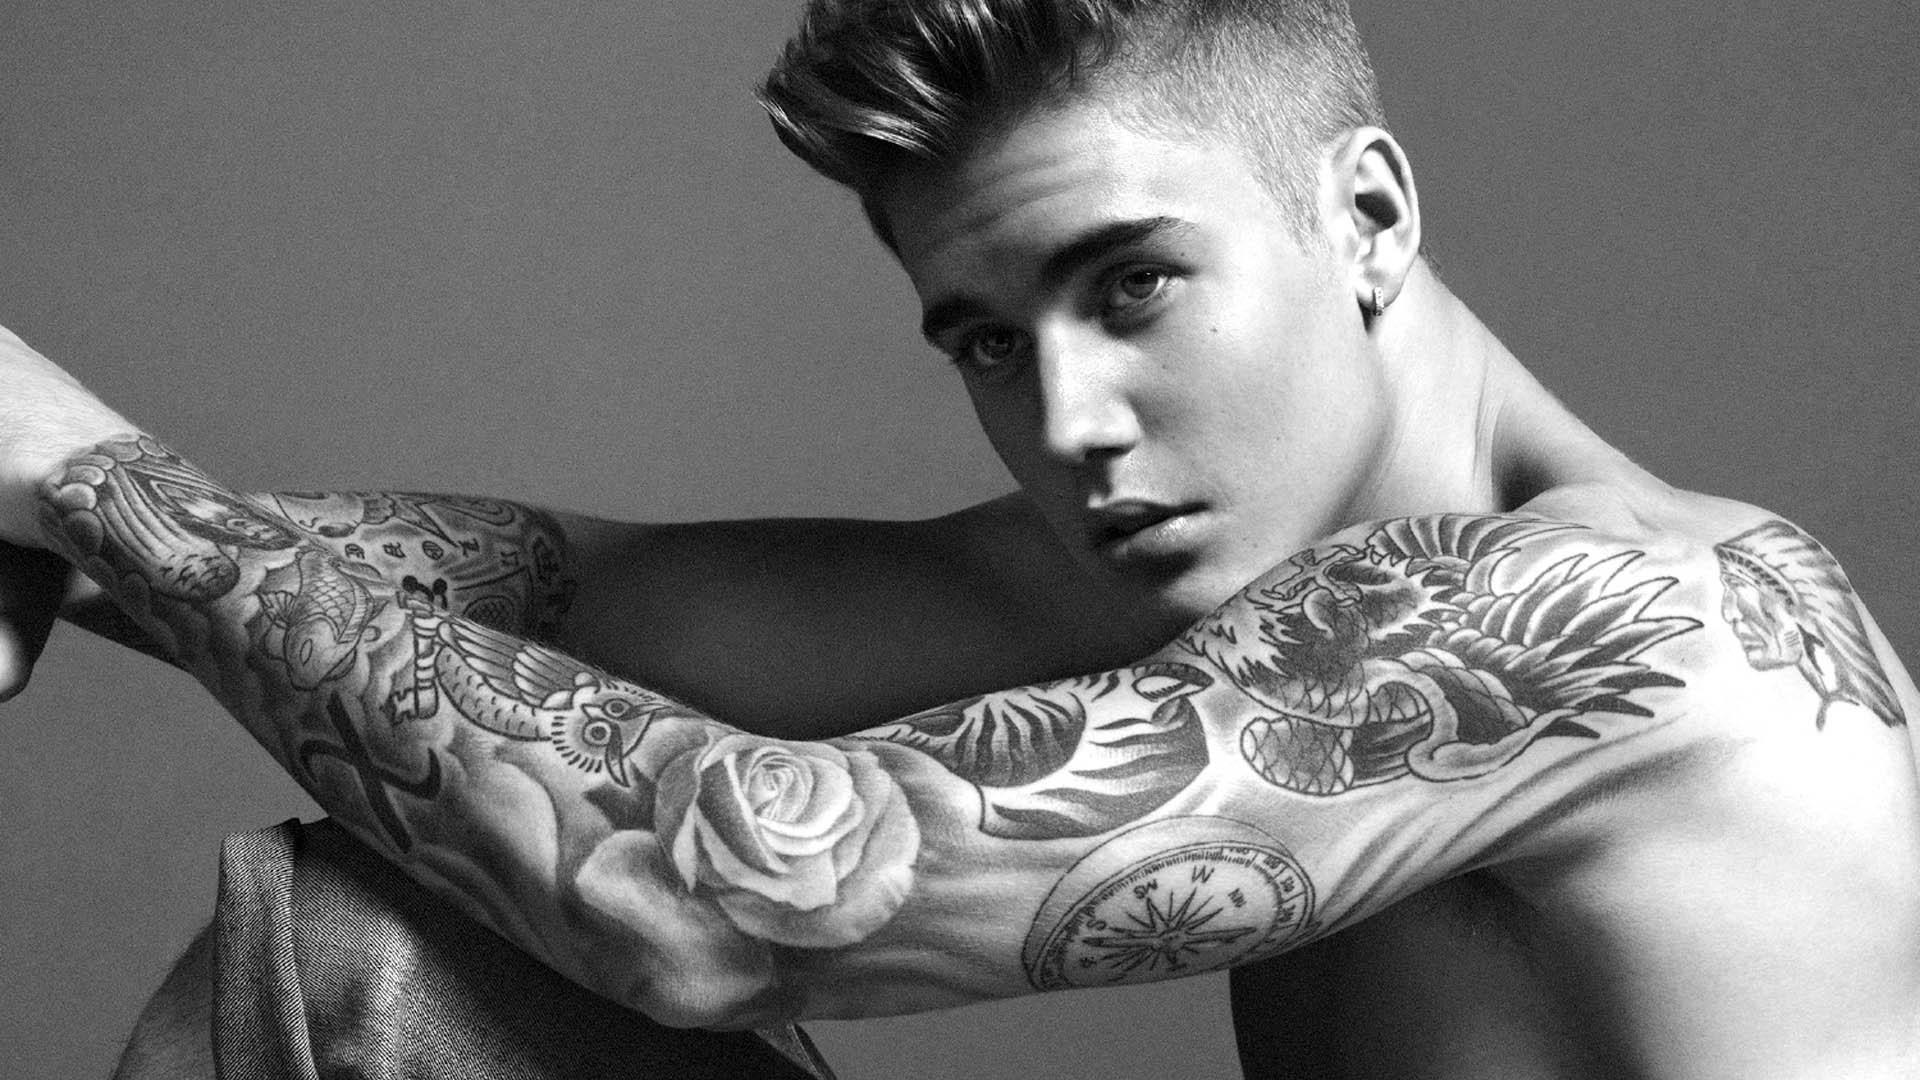 Justin Bieber HD Wallpaper 64 Images